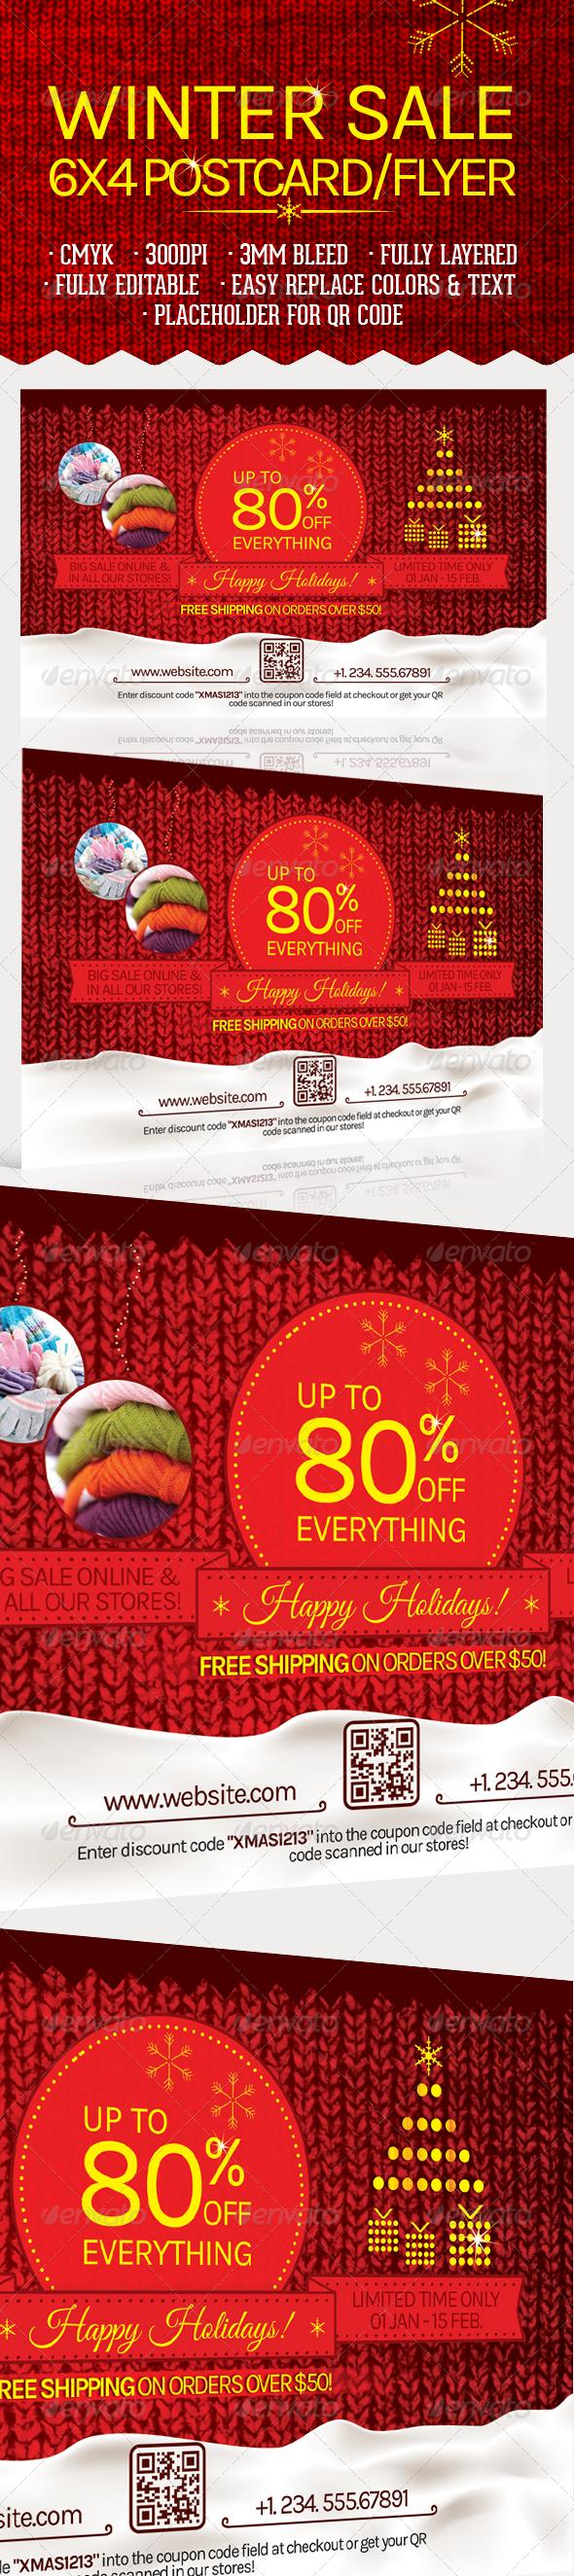 Winter Sale Postcard/Flyer - Commerce Flyers